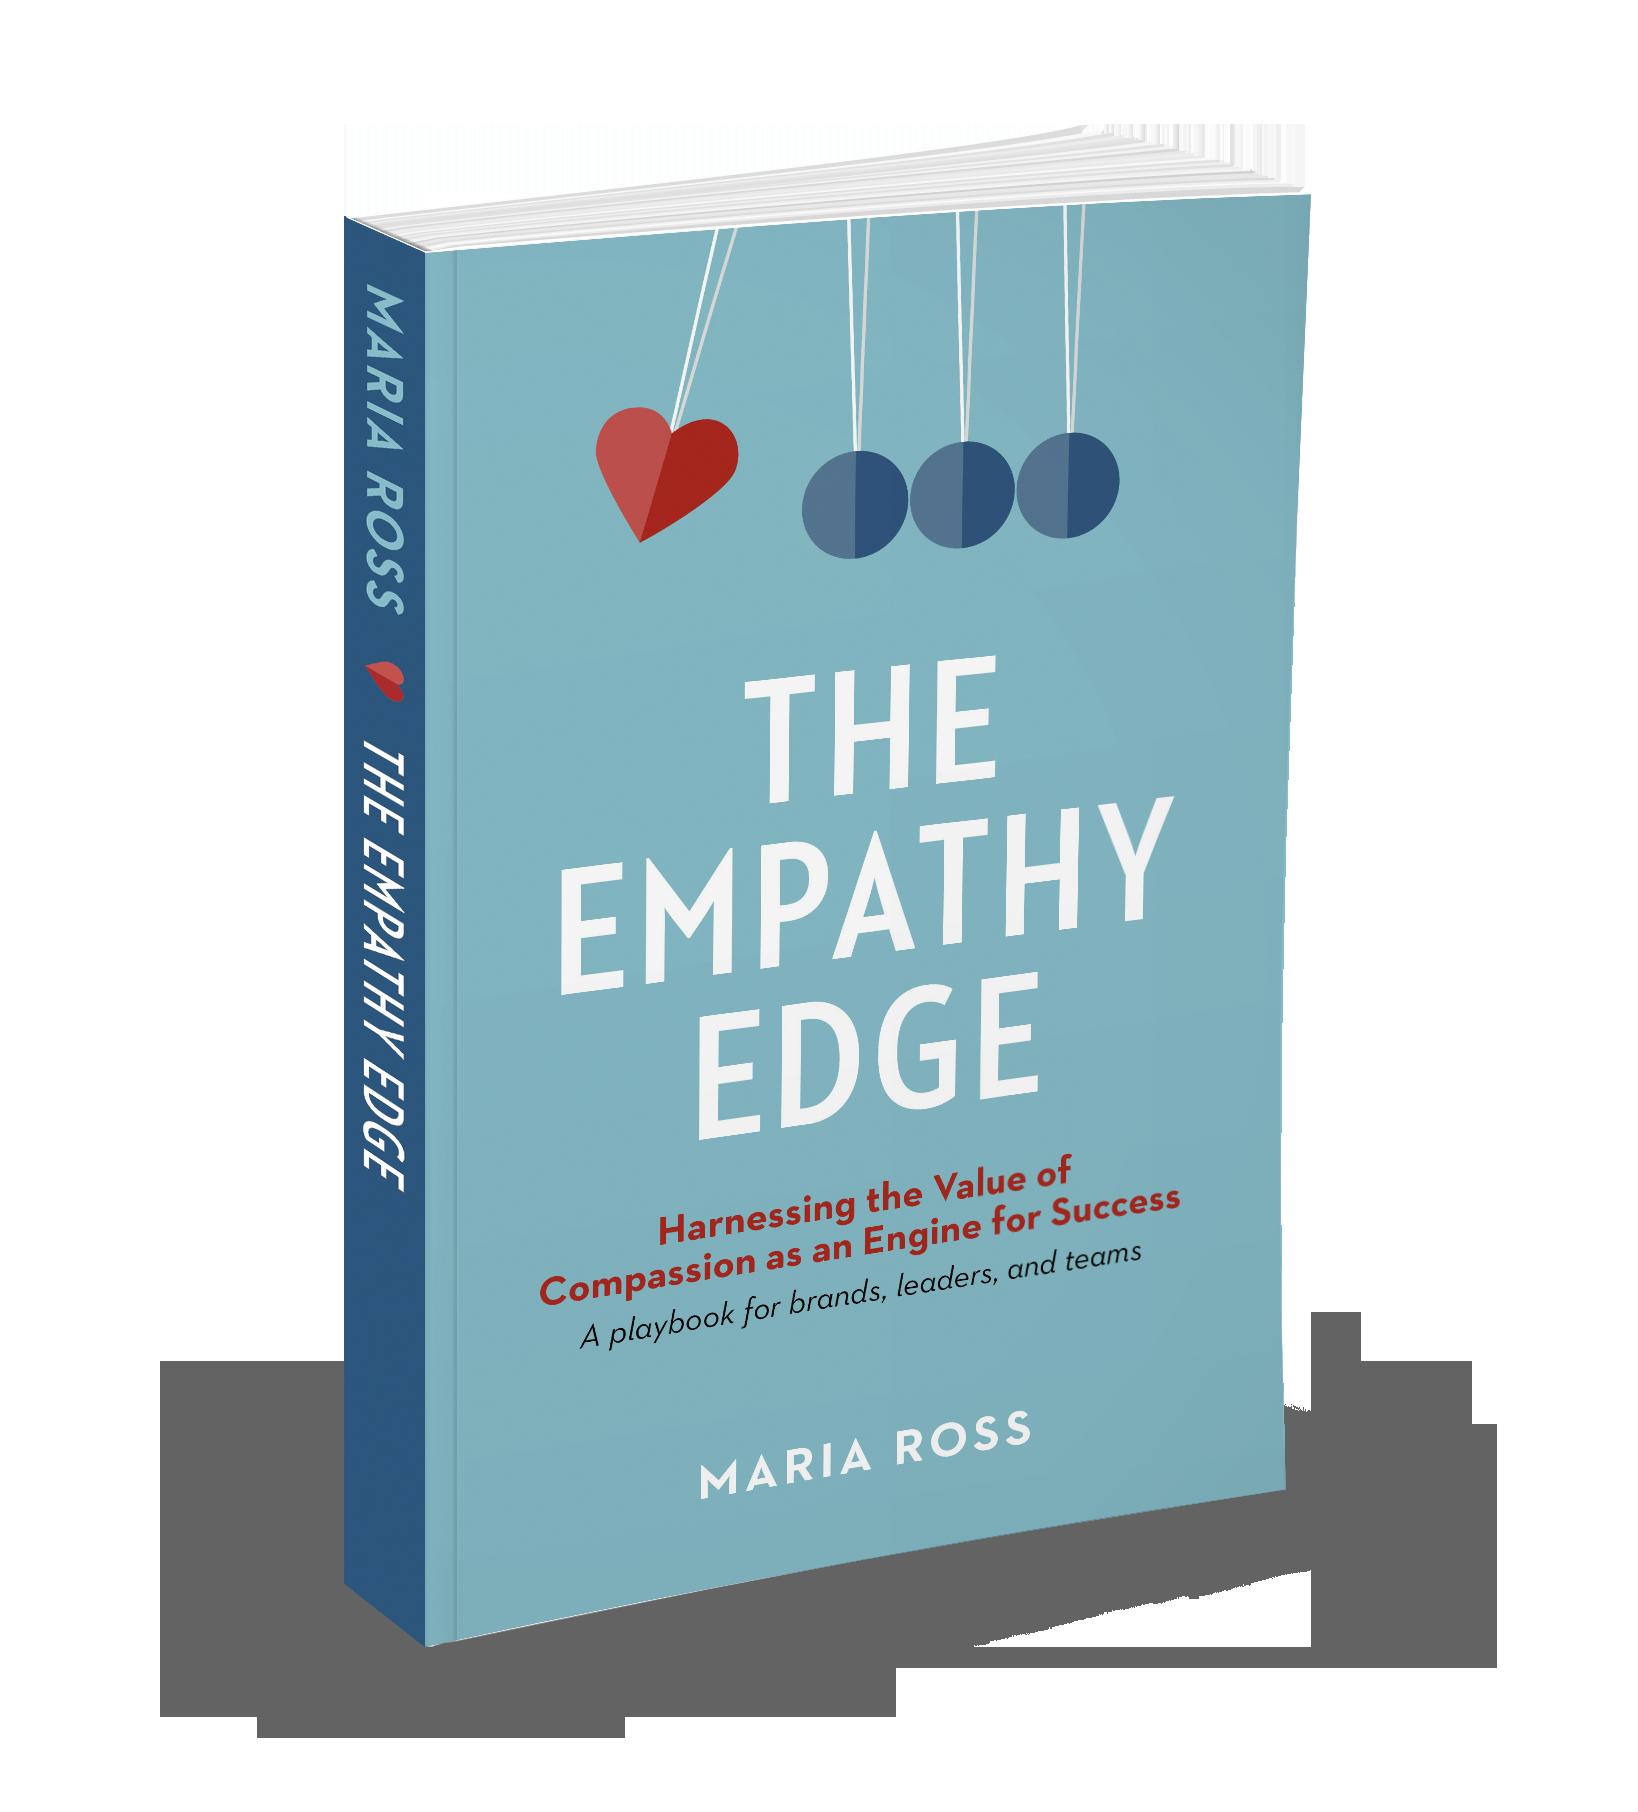 The Empathy Edge book cover